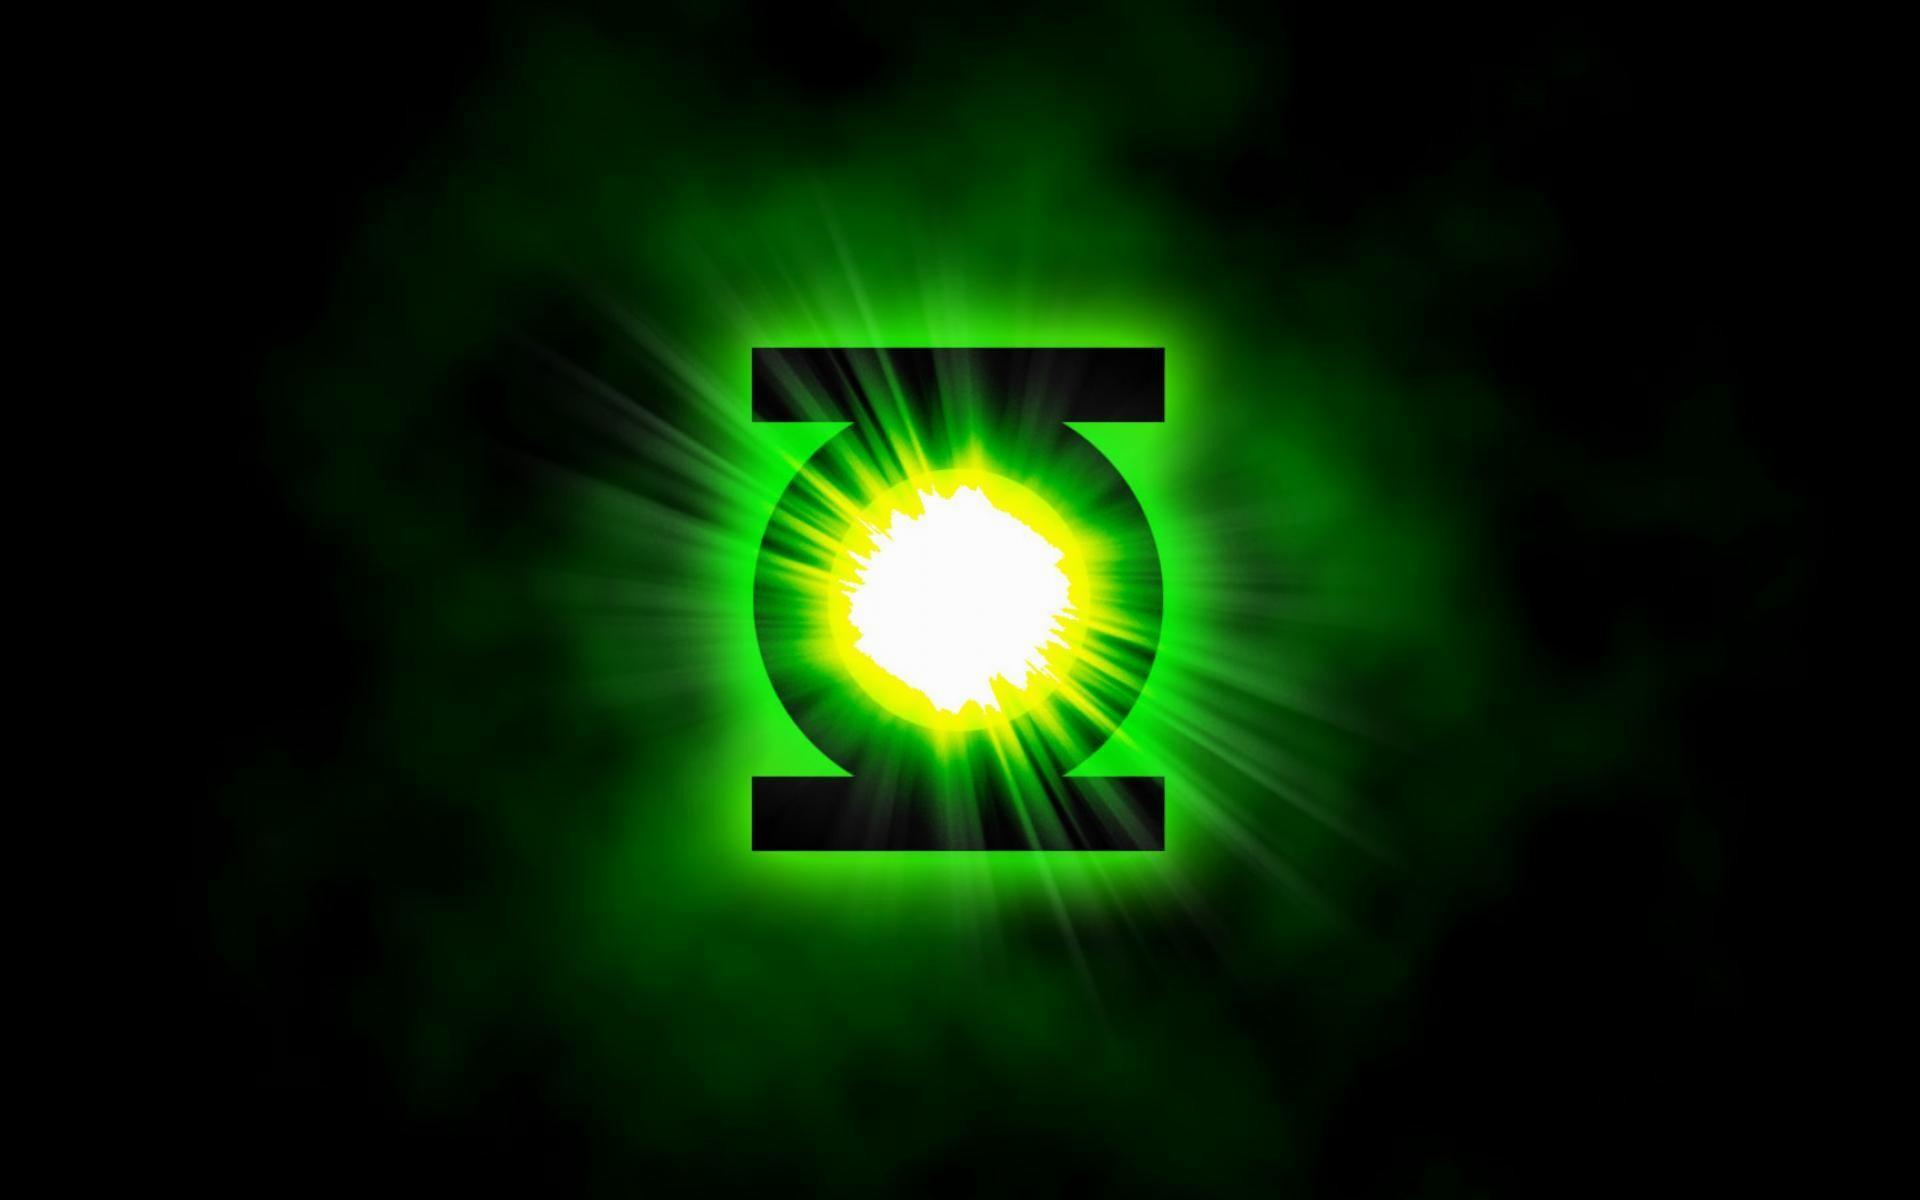 Superheroes-the-green-lantern-logo-desktop-hd-wallpapers